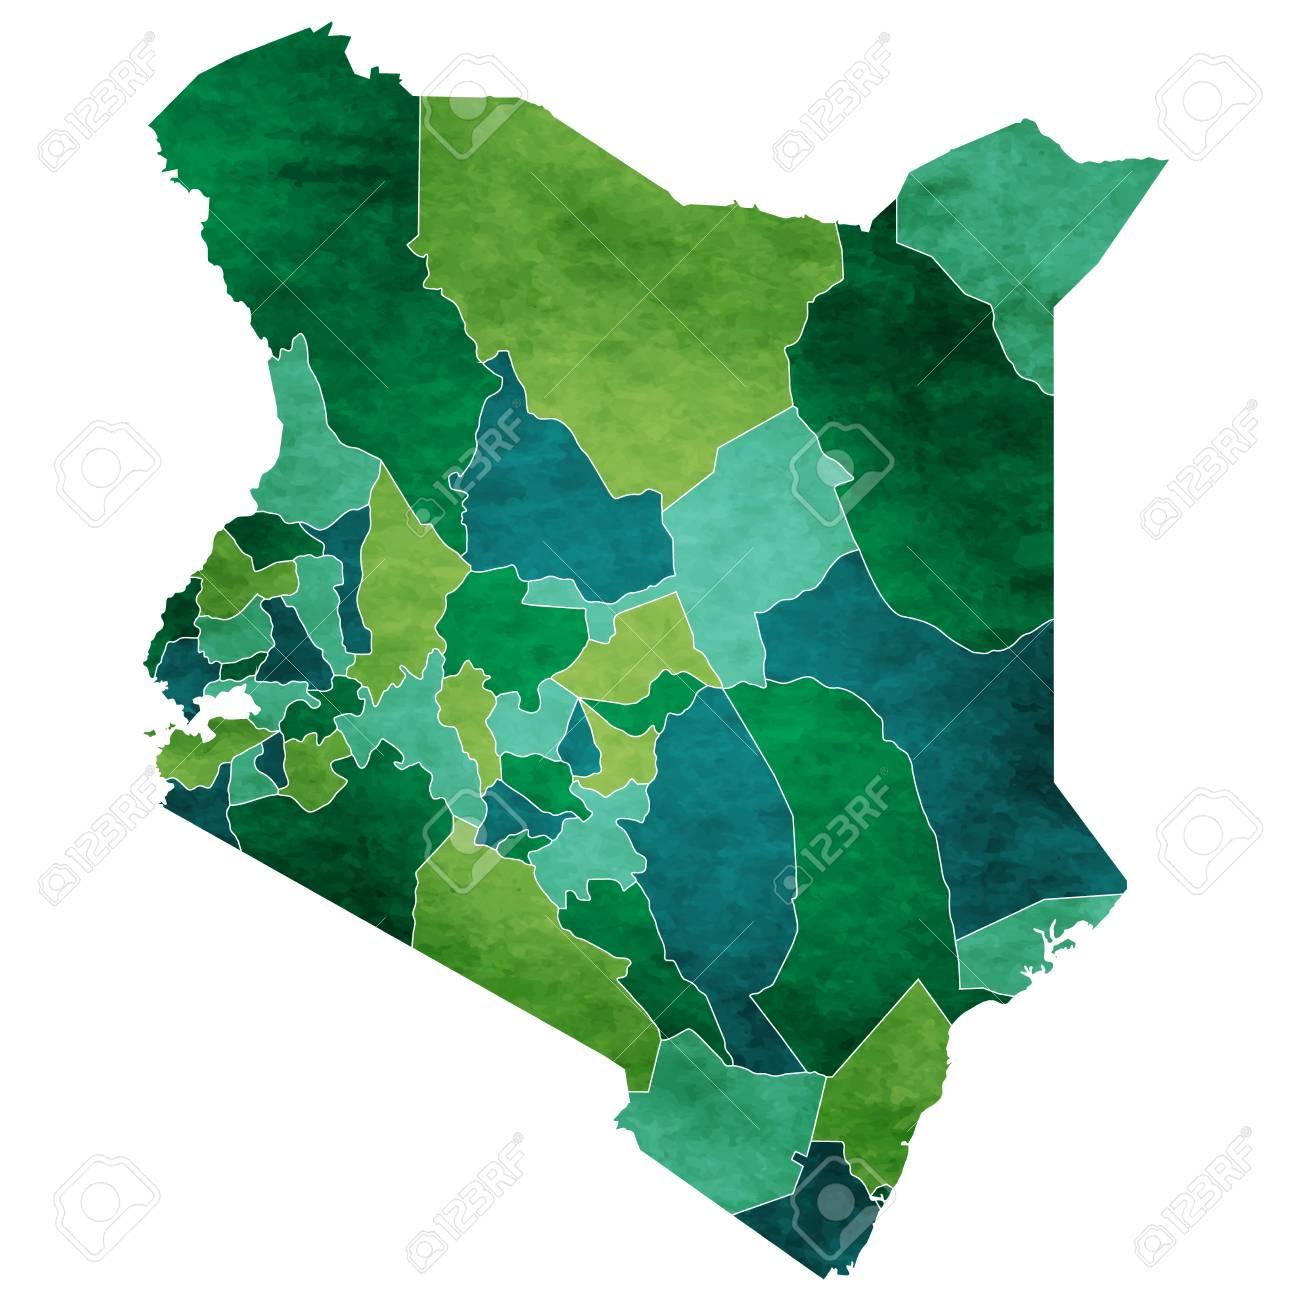 Kenya World Map Country Icon Royalty Free Cliparts Vectors And